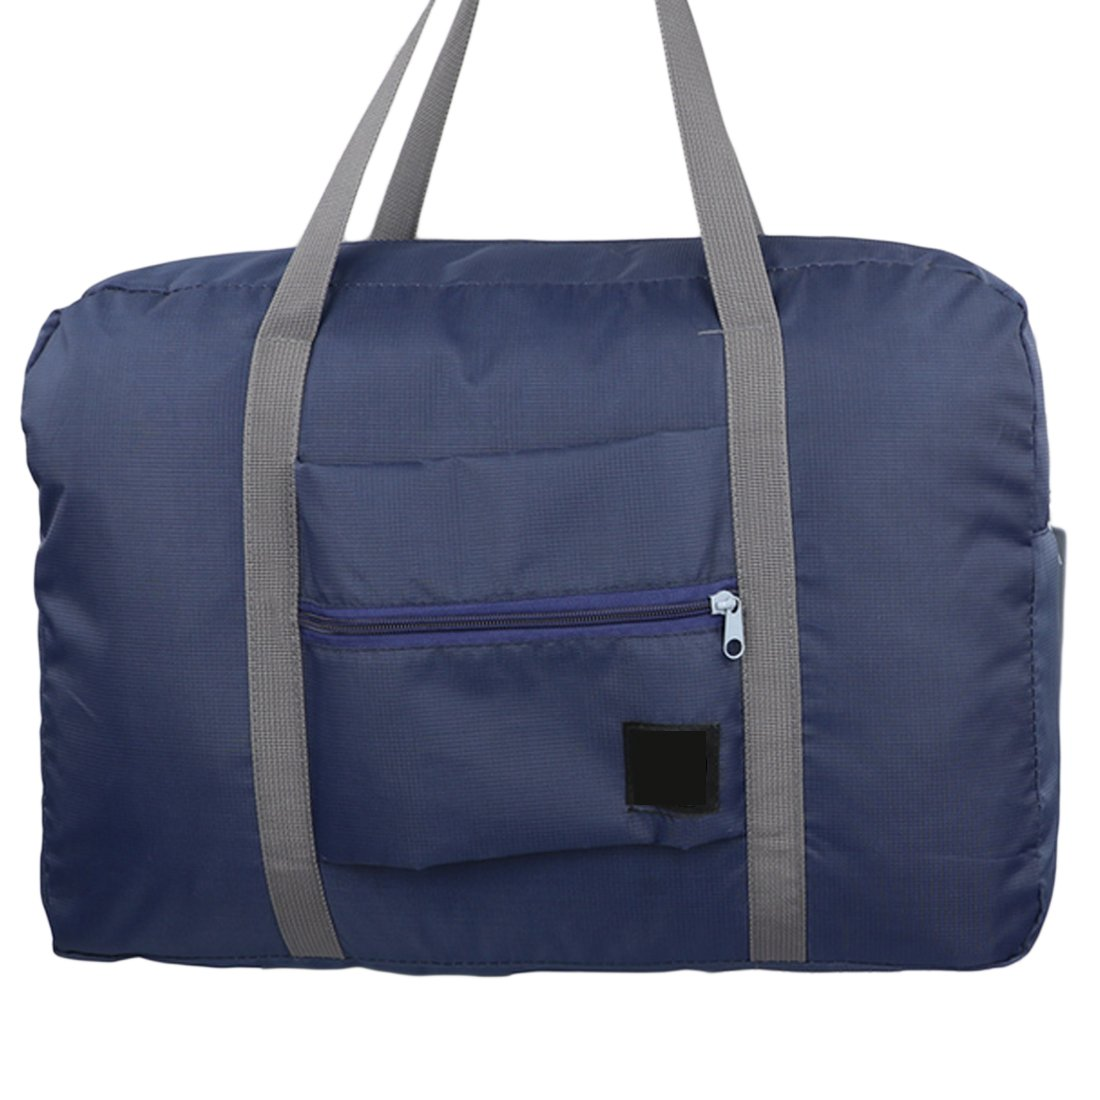 Plegable bolsa de viaje de nailon para equipaje bolsas de almacenamiento hogar ropa organizador bolsas Luwu-Store